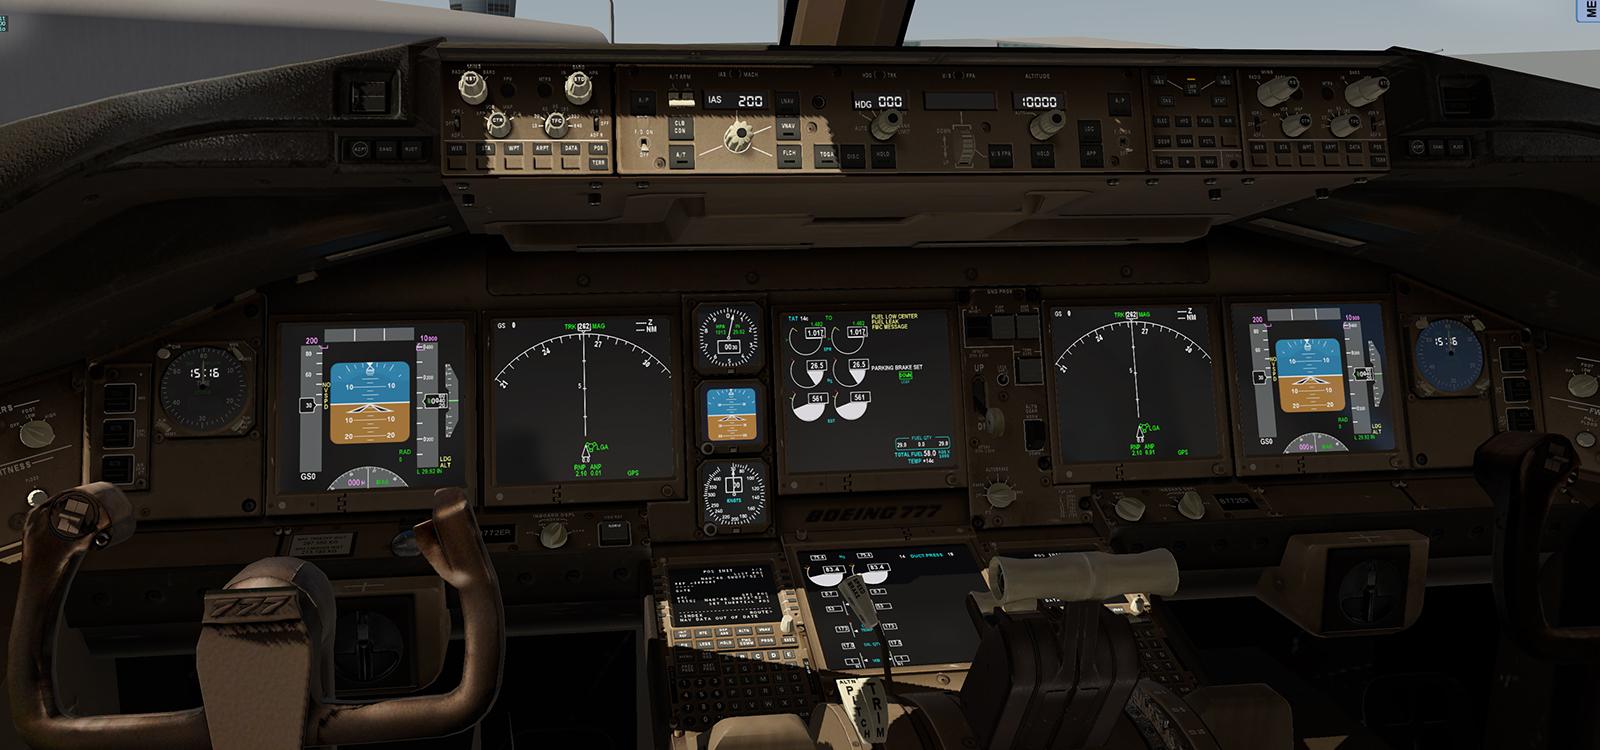 777-200ER_xp11_49